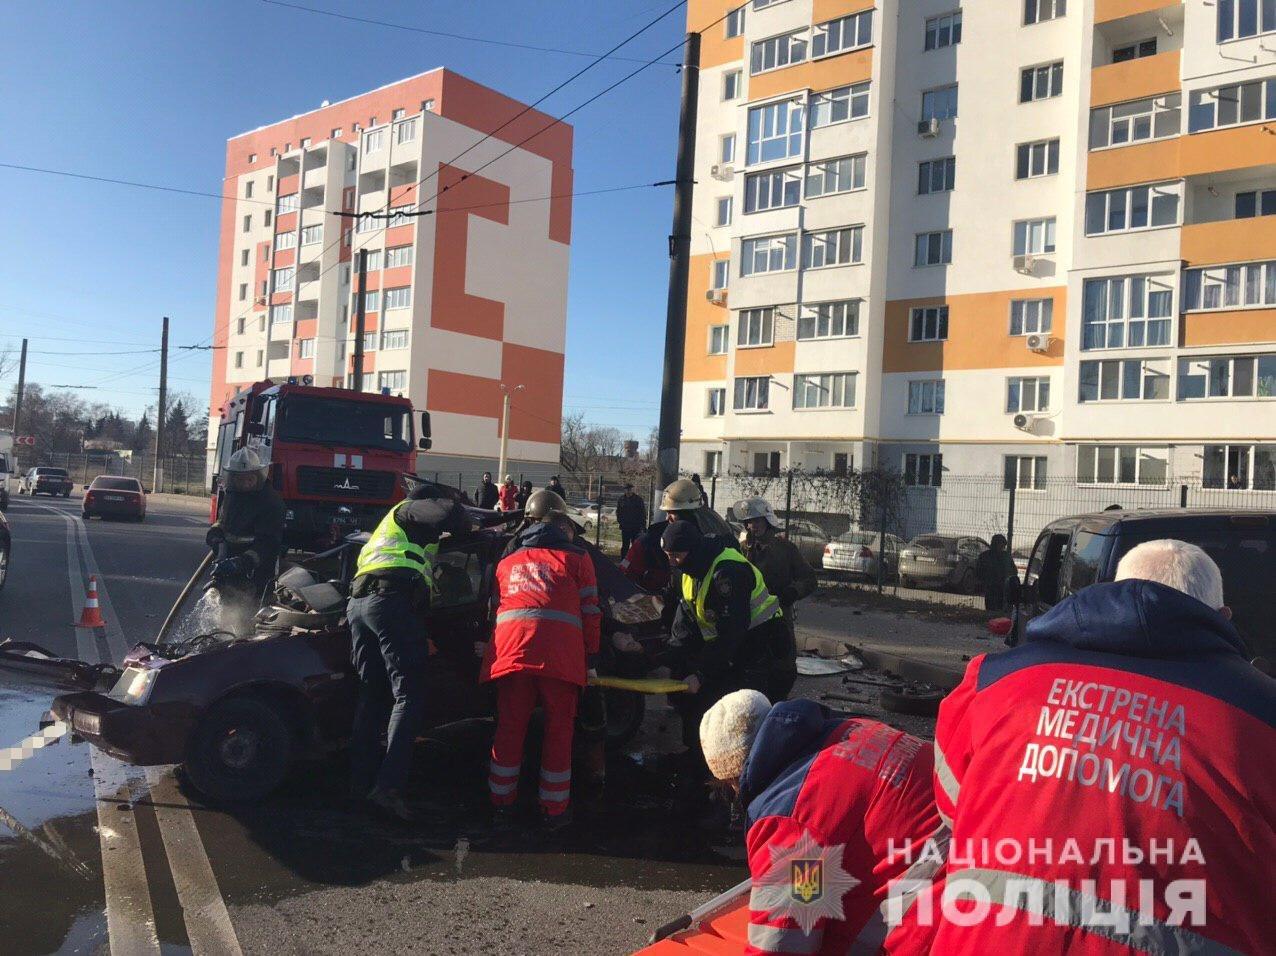 В Харькове пассажирка автомобиля погибла в результате ДТП, - ФОТО, фото-2